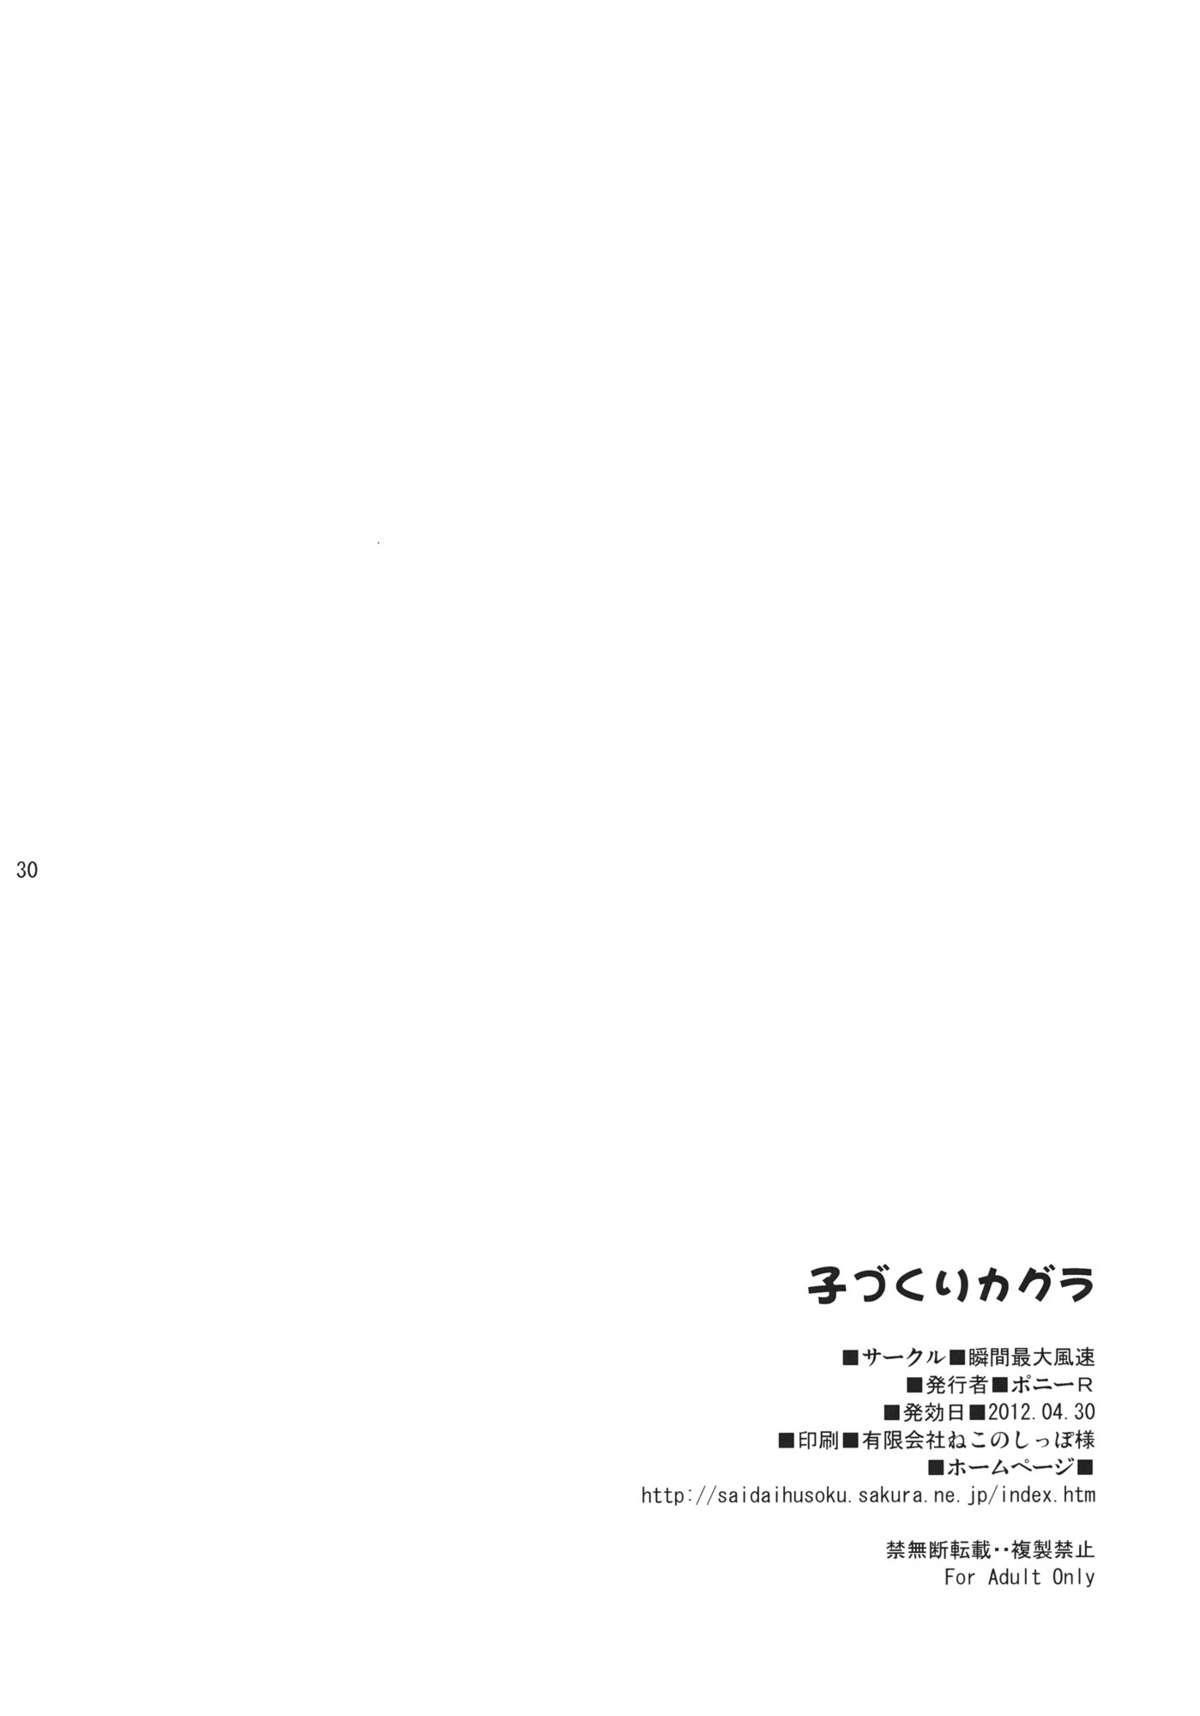 Kodukuri Kagura 28